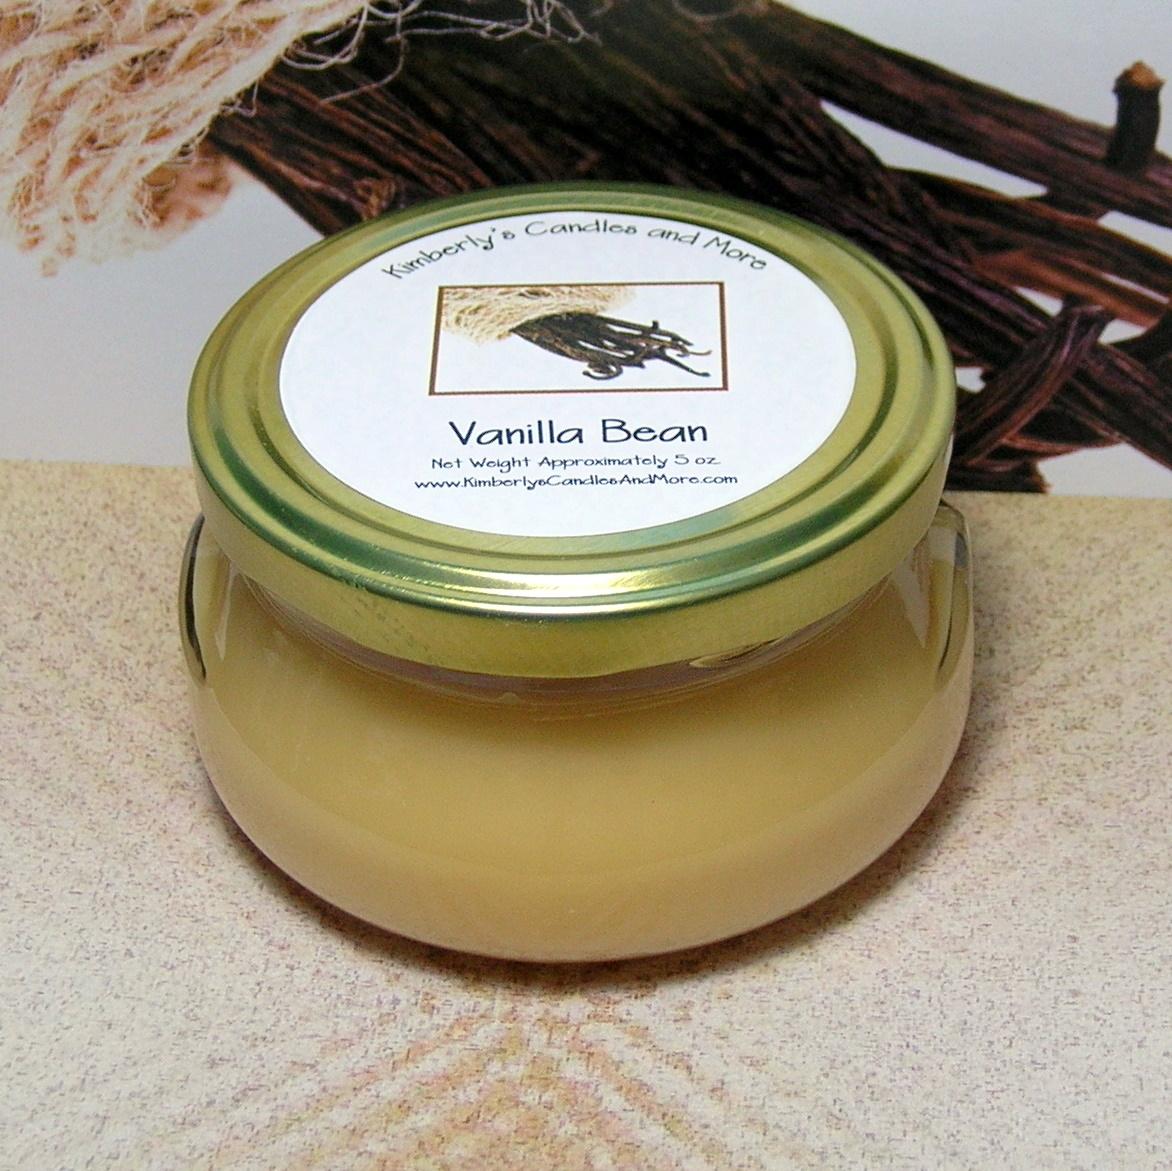 Wickless vanilla bean 1